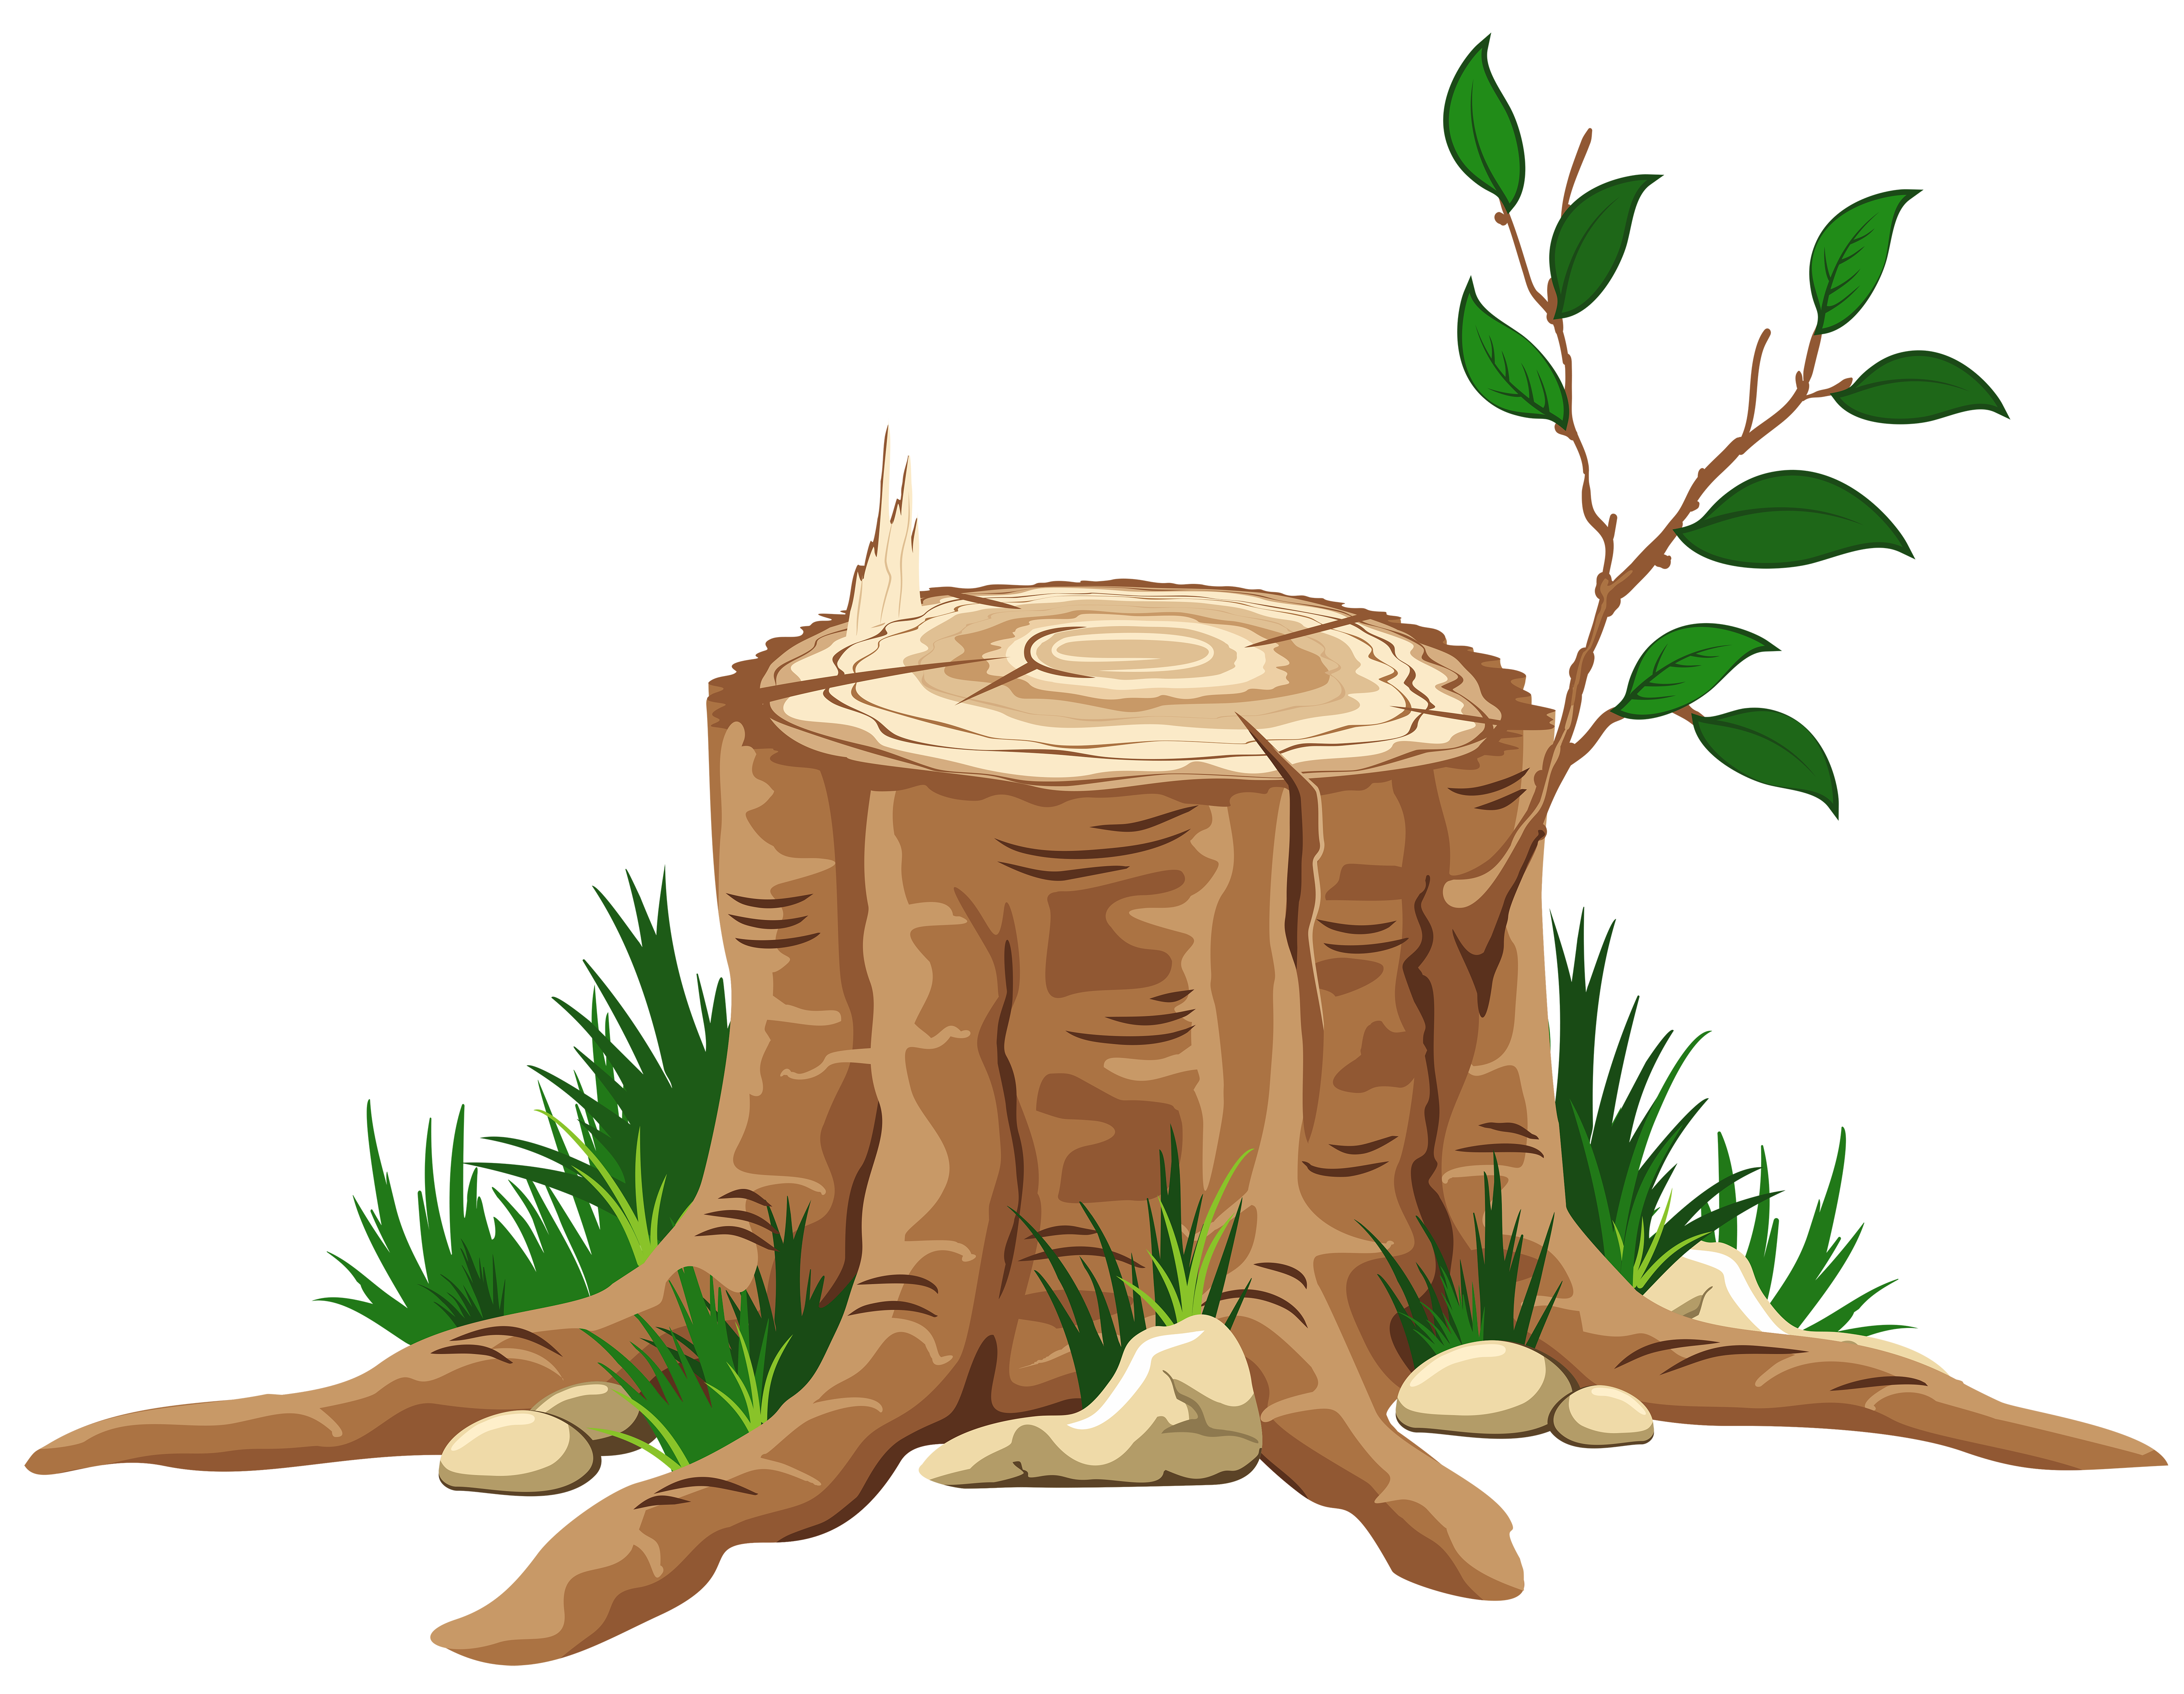 5000x3879 Transparent Tree Stump Png Clipartu200b Gallery Yopriceville